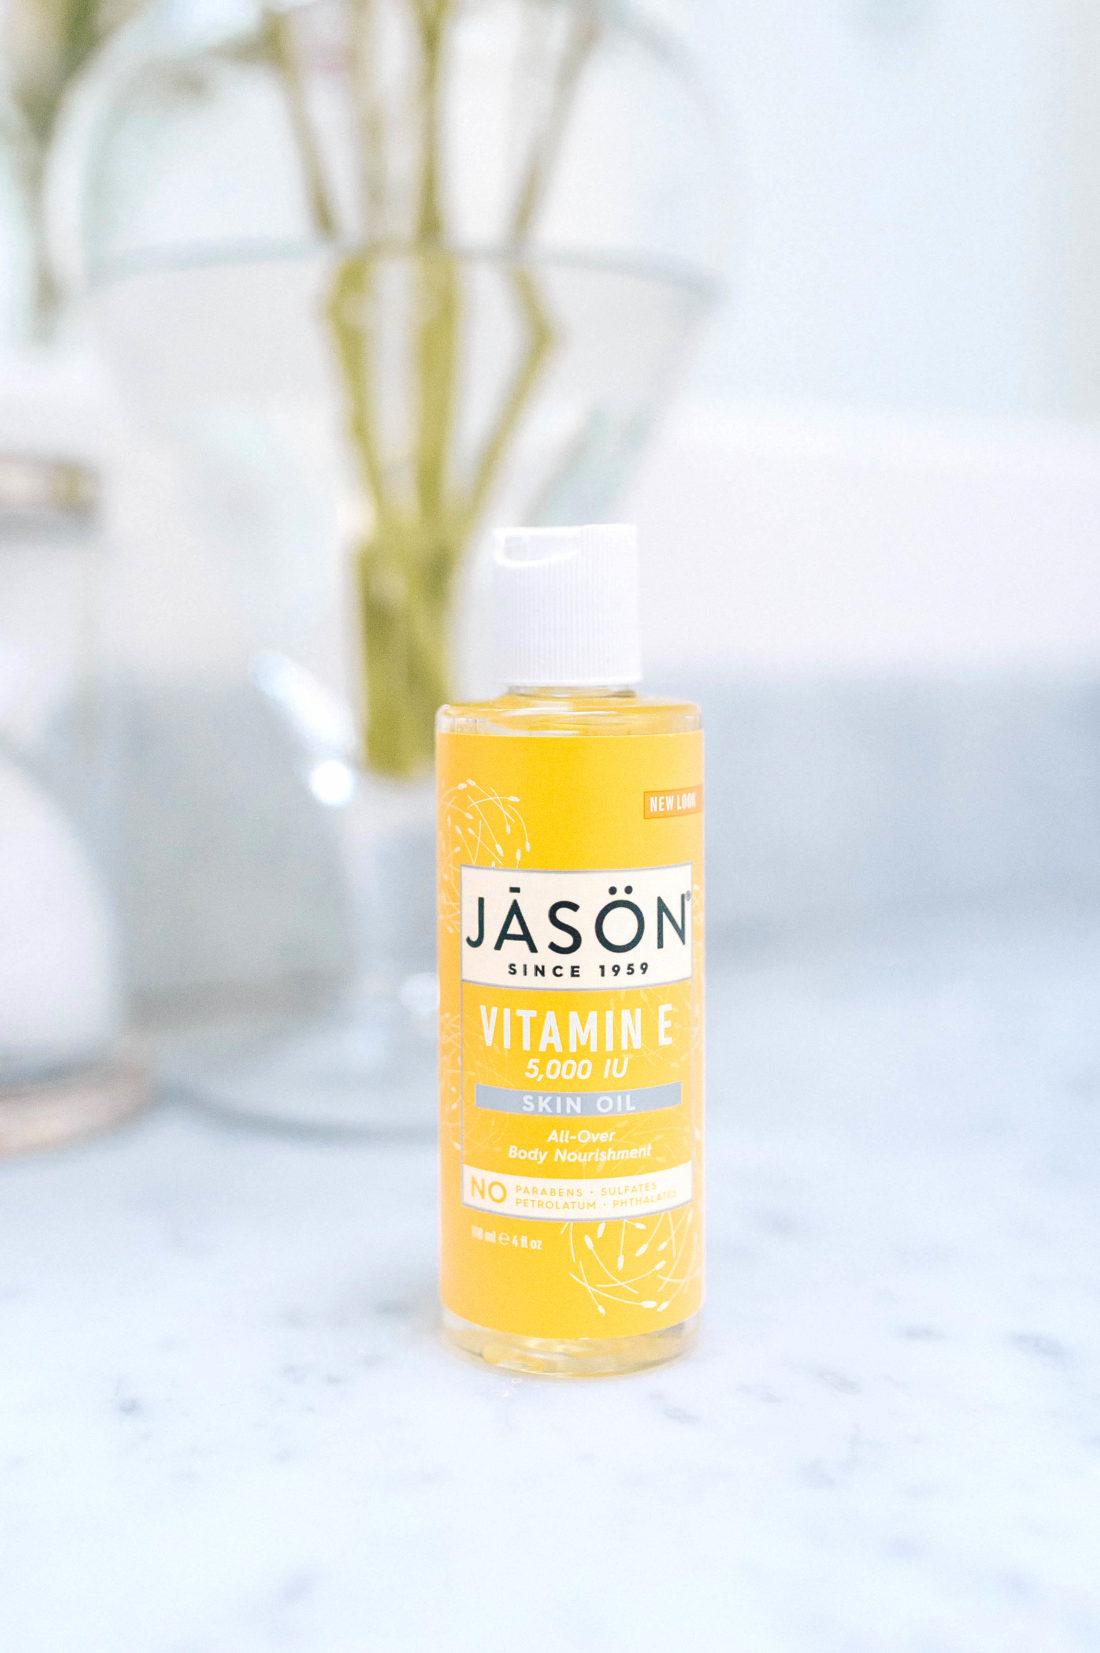 Jason Vitamnin E Oil Lotion